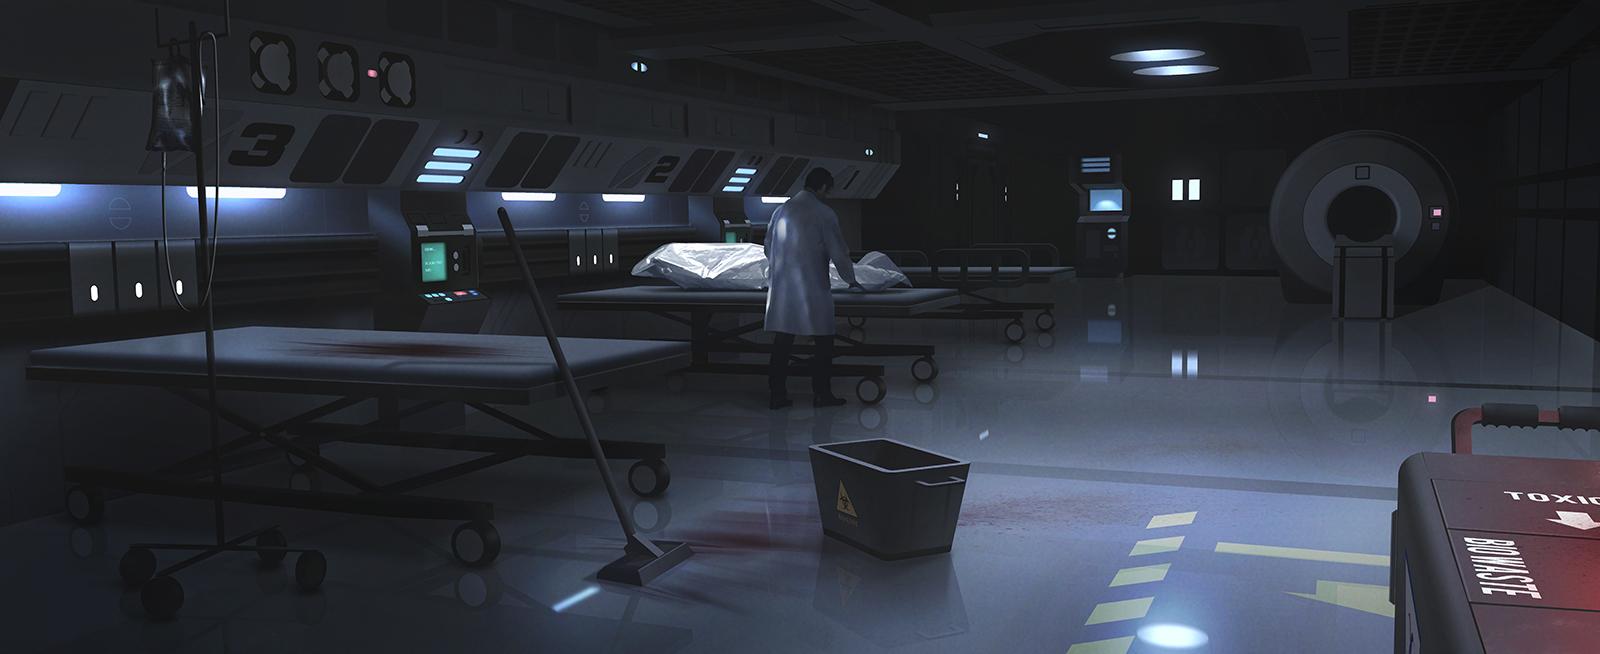 Medical Bay